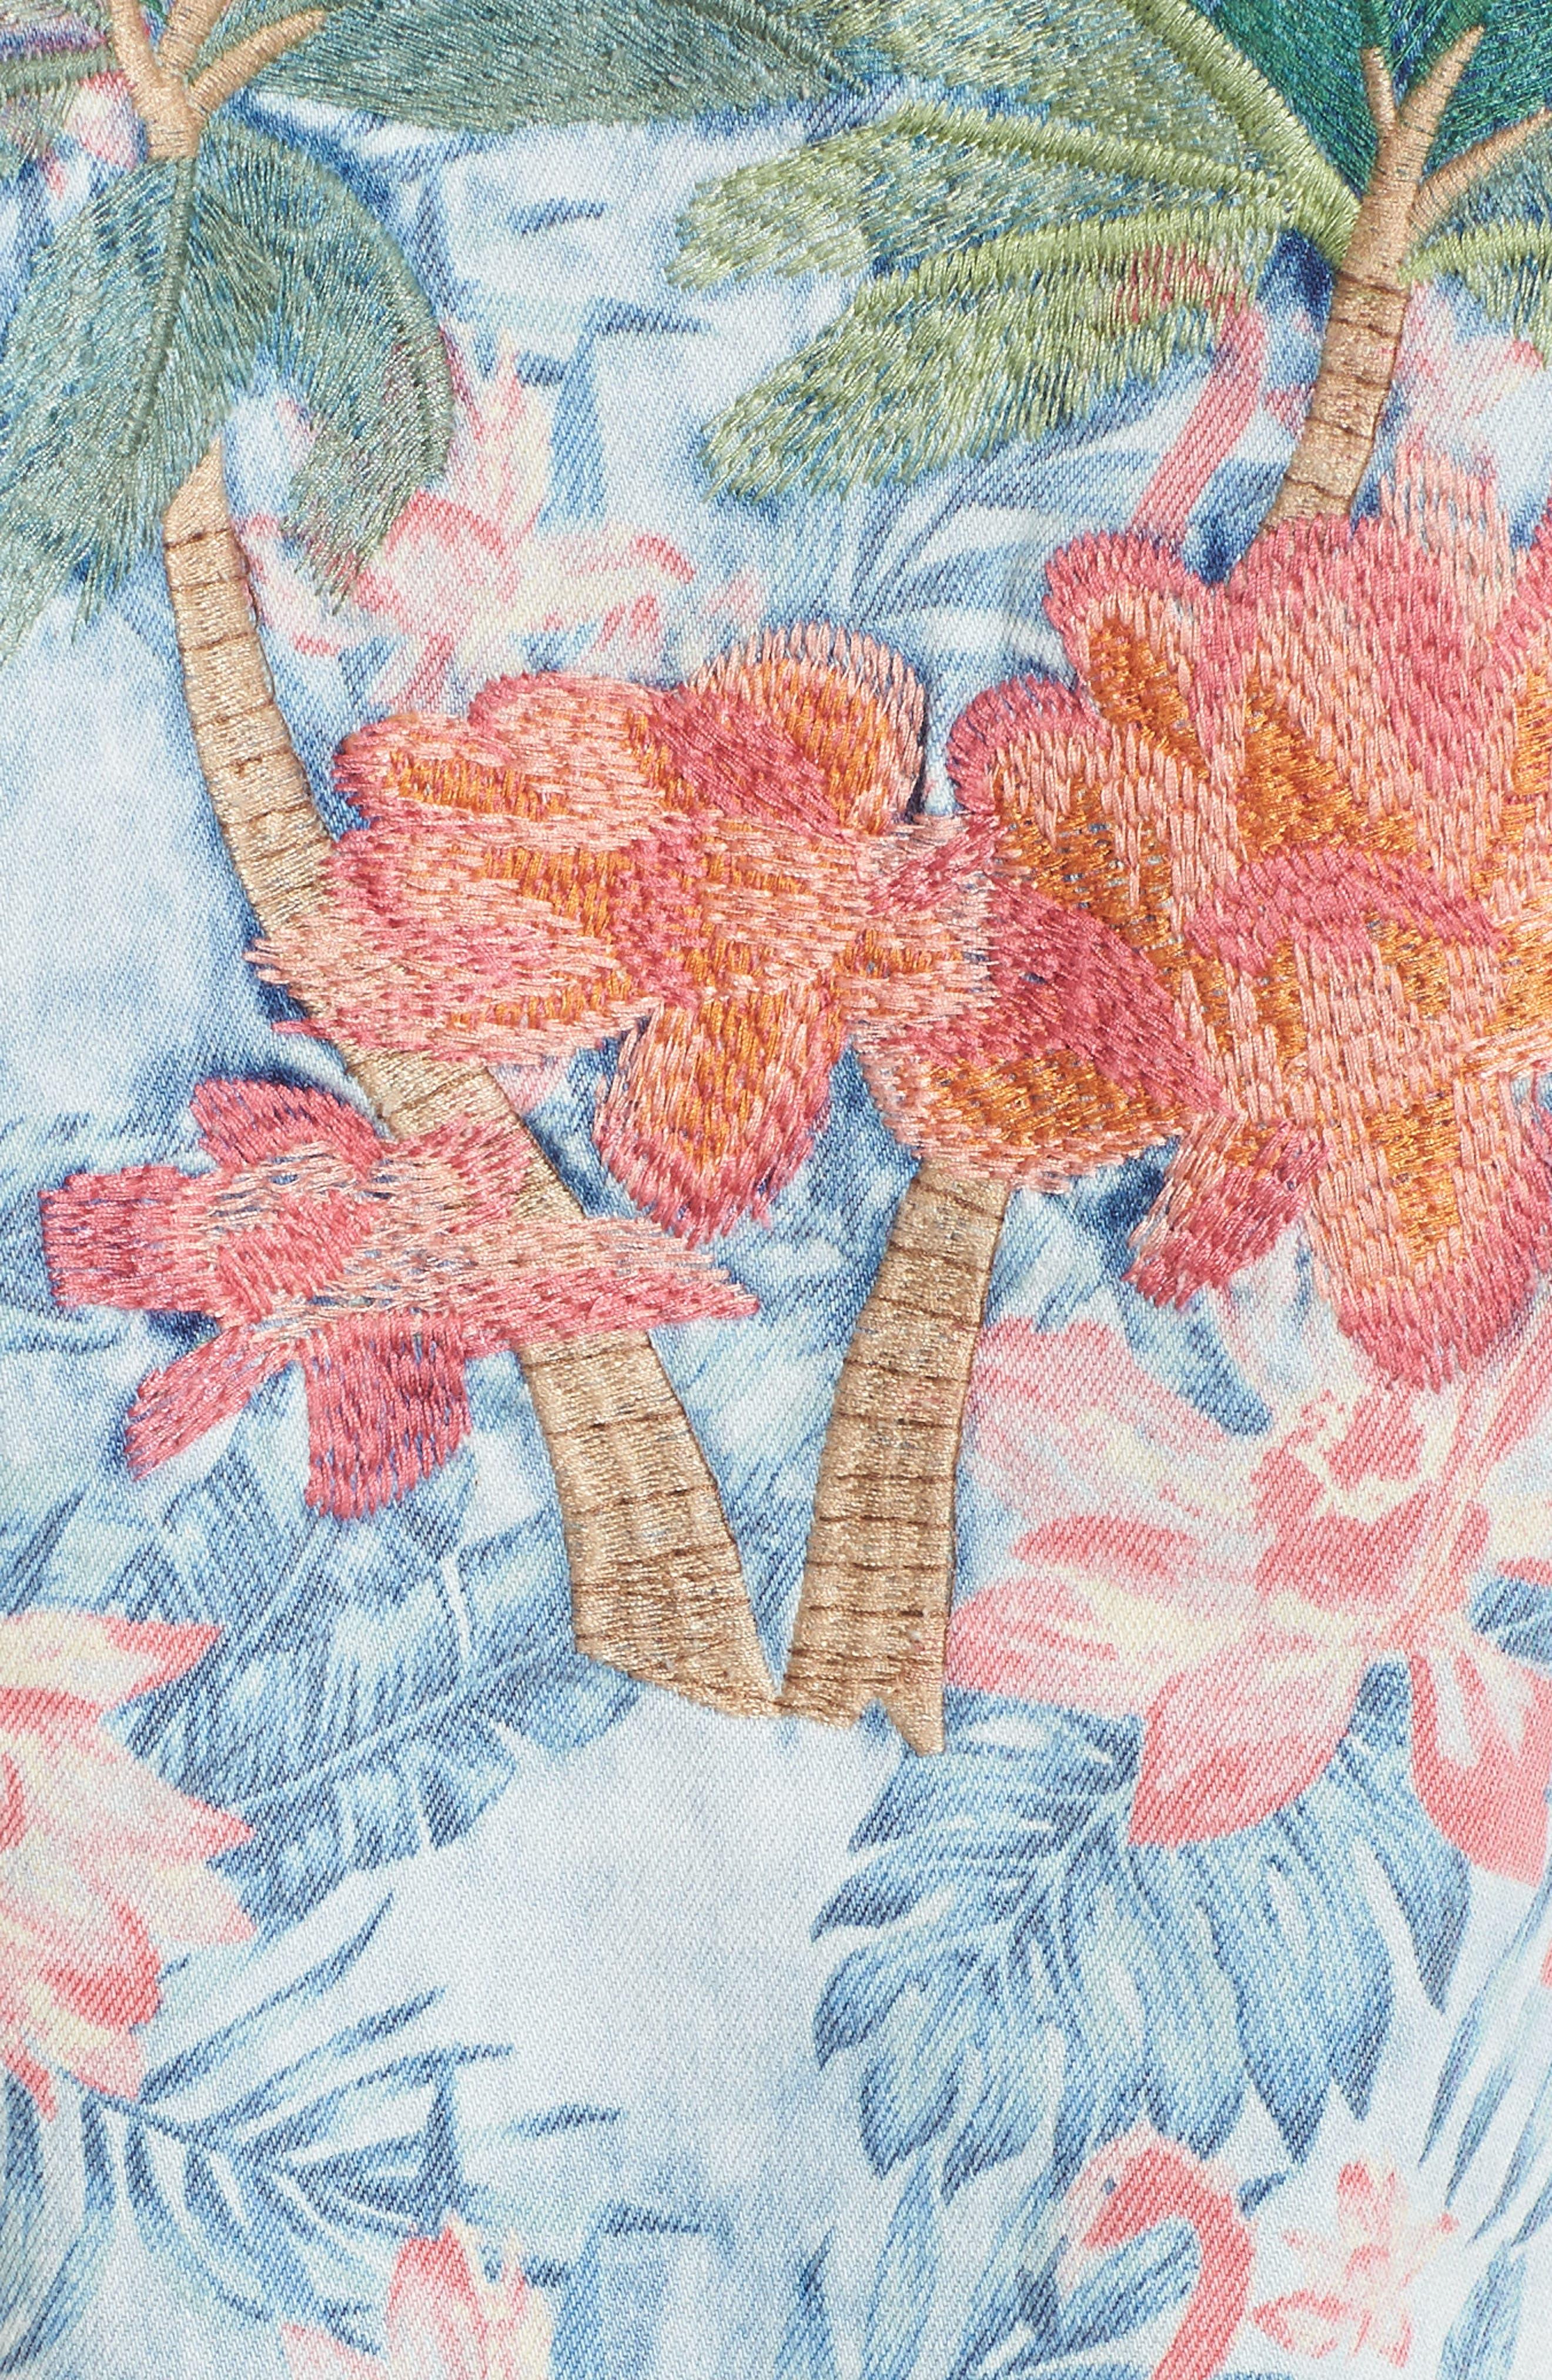 Embroidered Floral Denim Jacket,                             Alternate thumbnail 6, color,                             Light Blue Paradise